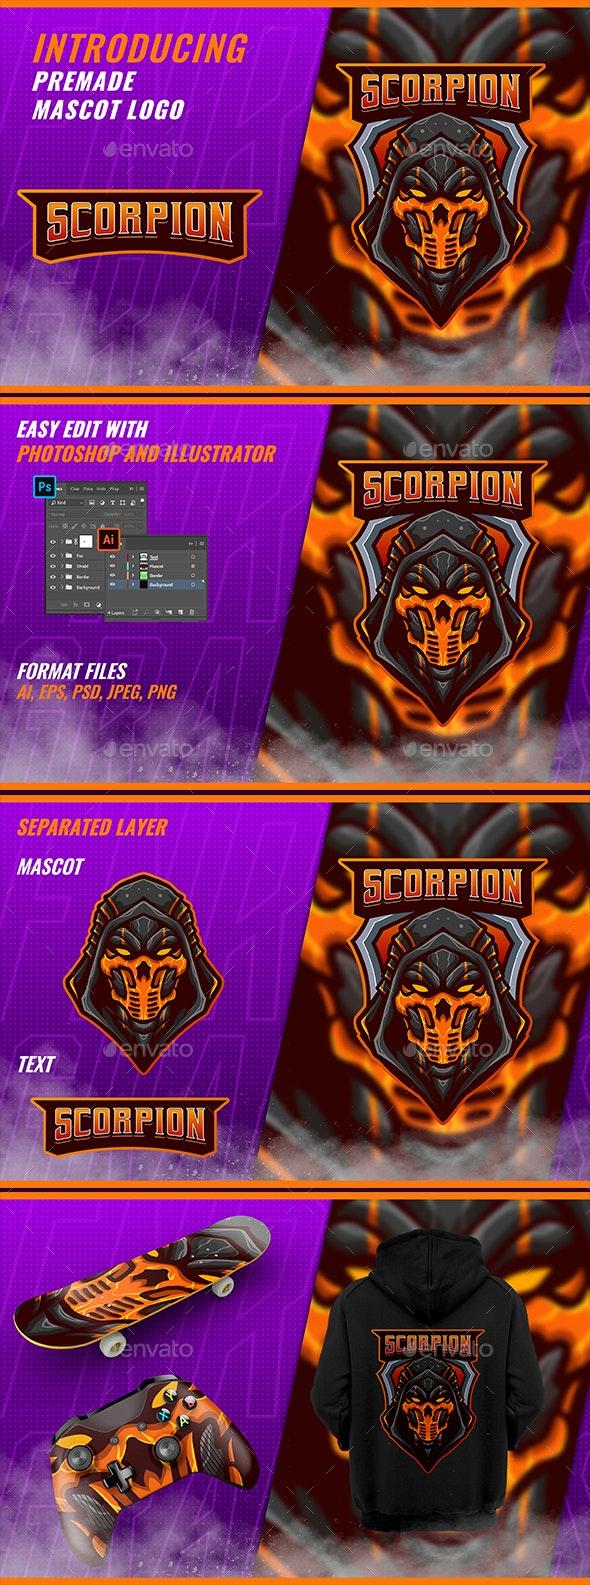 Scorpion Ninja - Mascot & Esport Logo - Vector Abstract